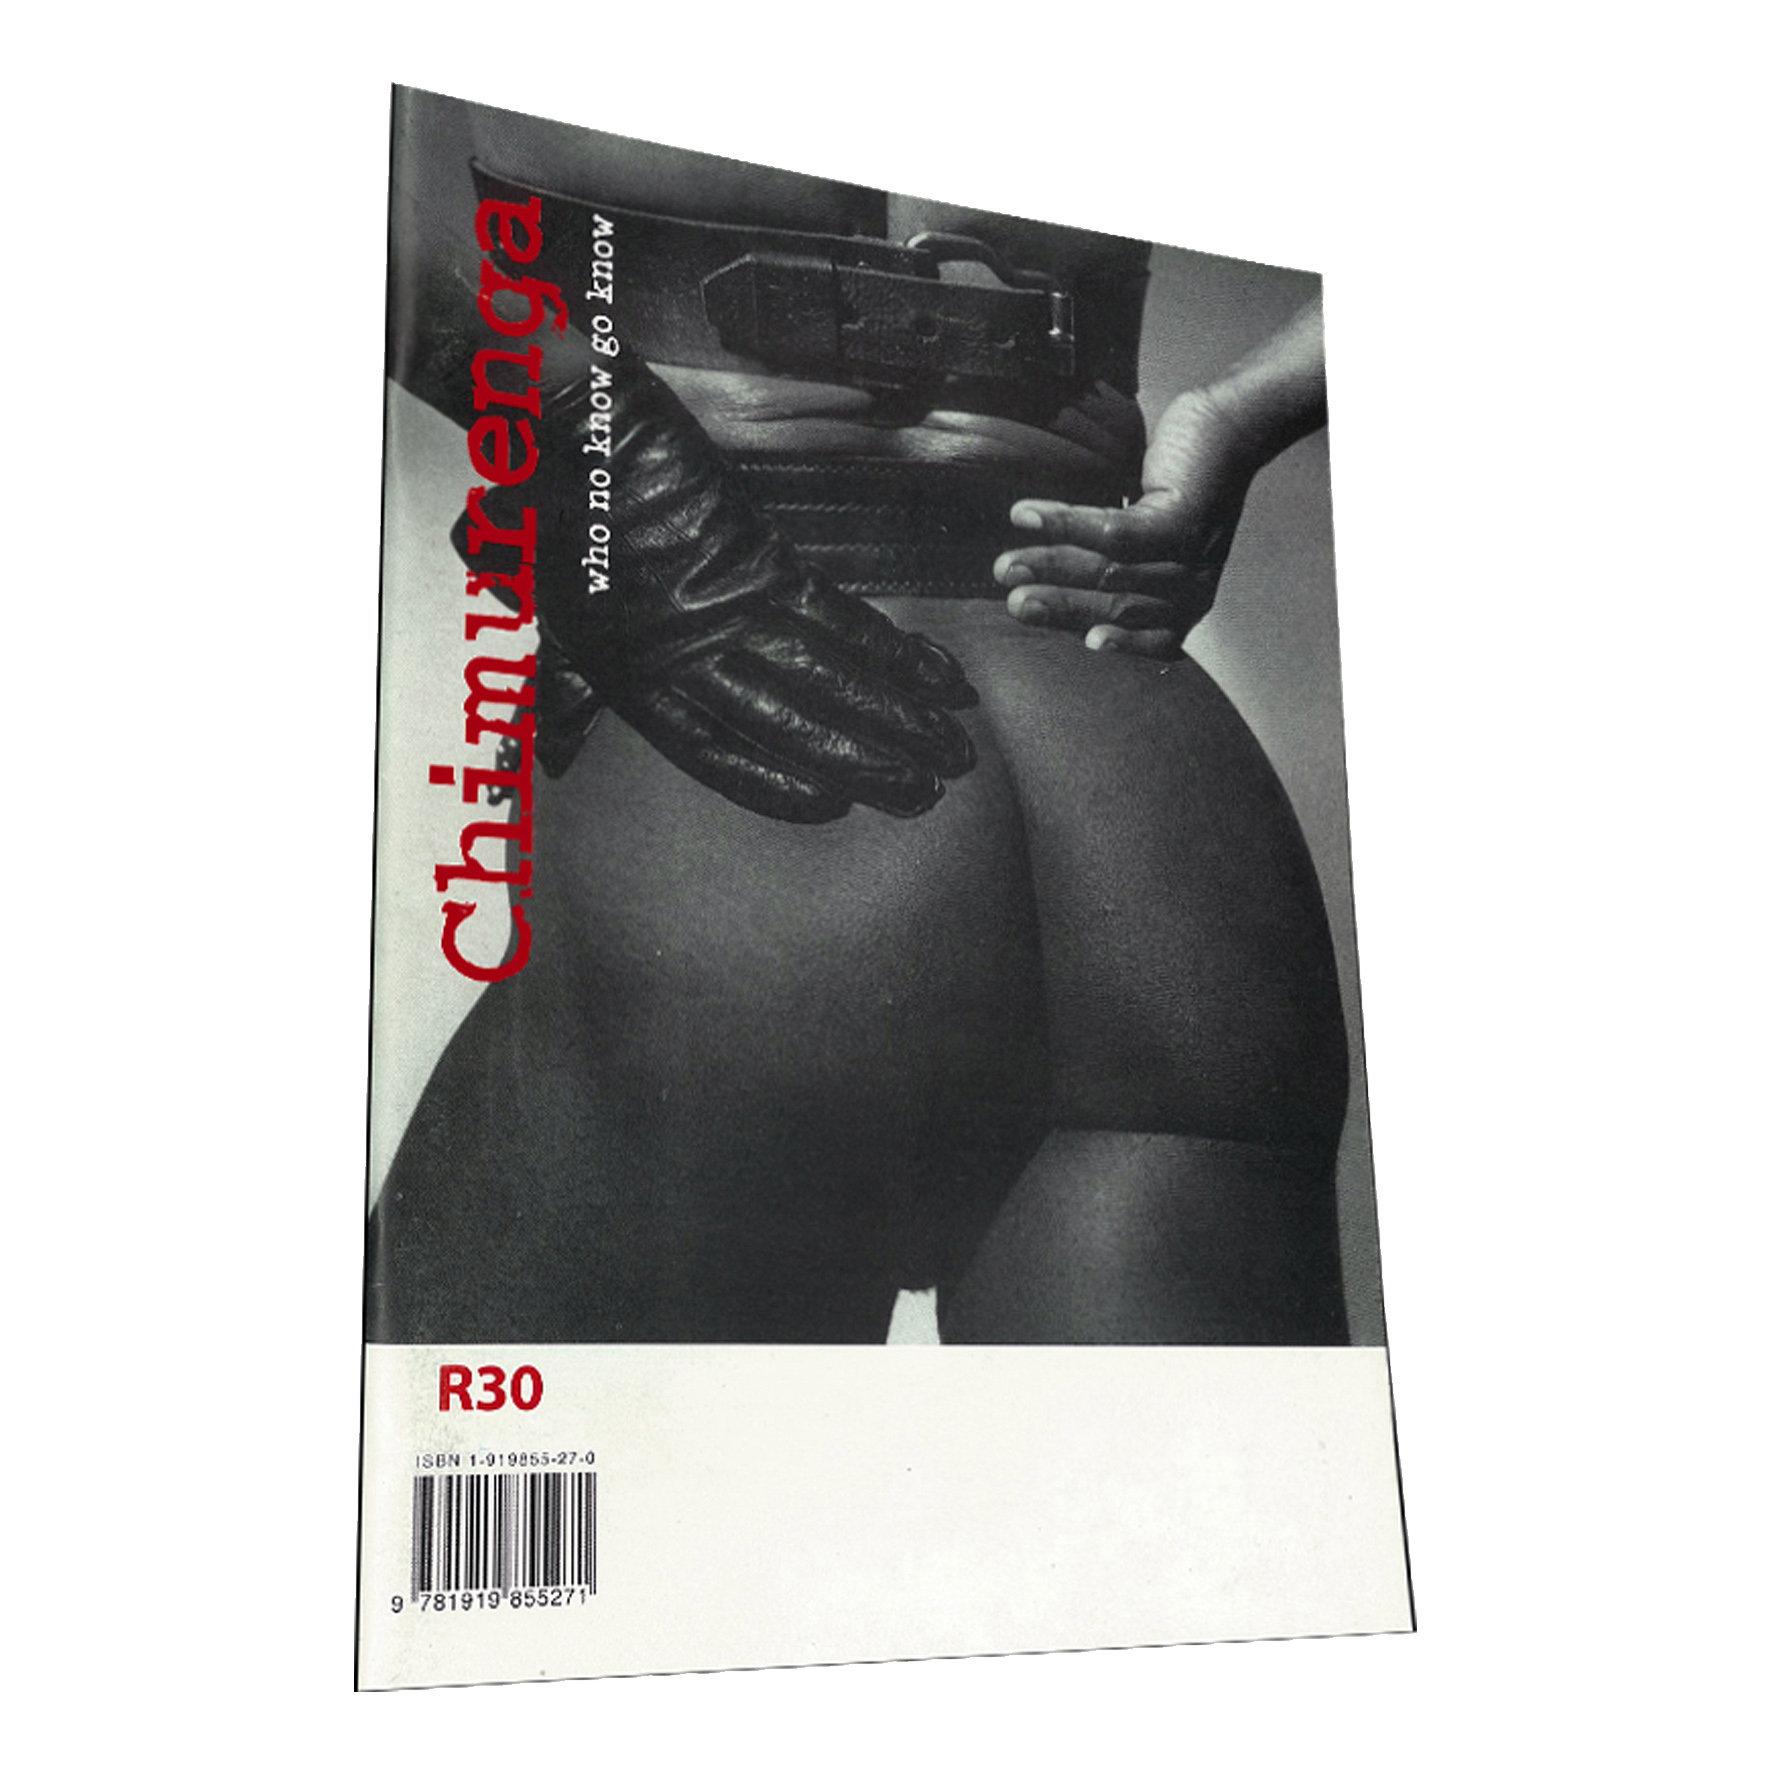 Chimurenga 04: Black Gays & Mugabes (May 2003) Print CJ04